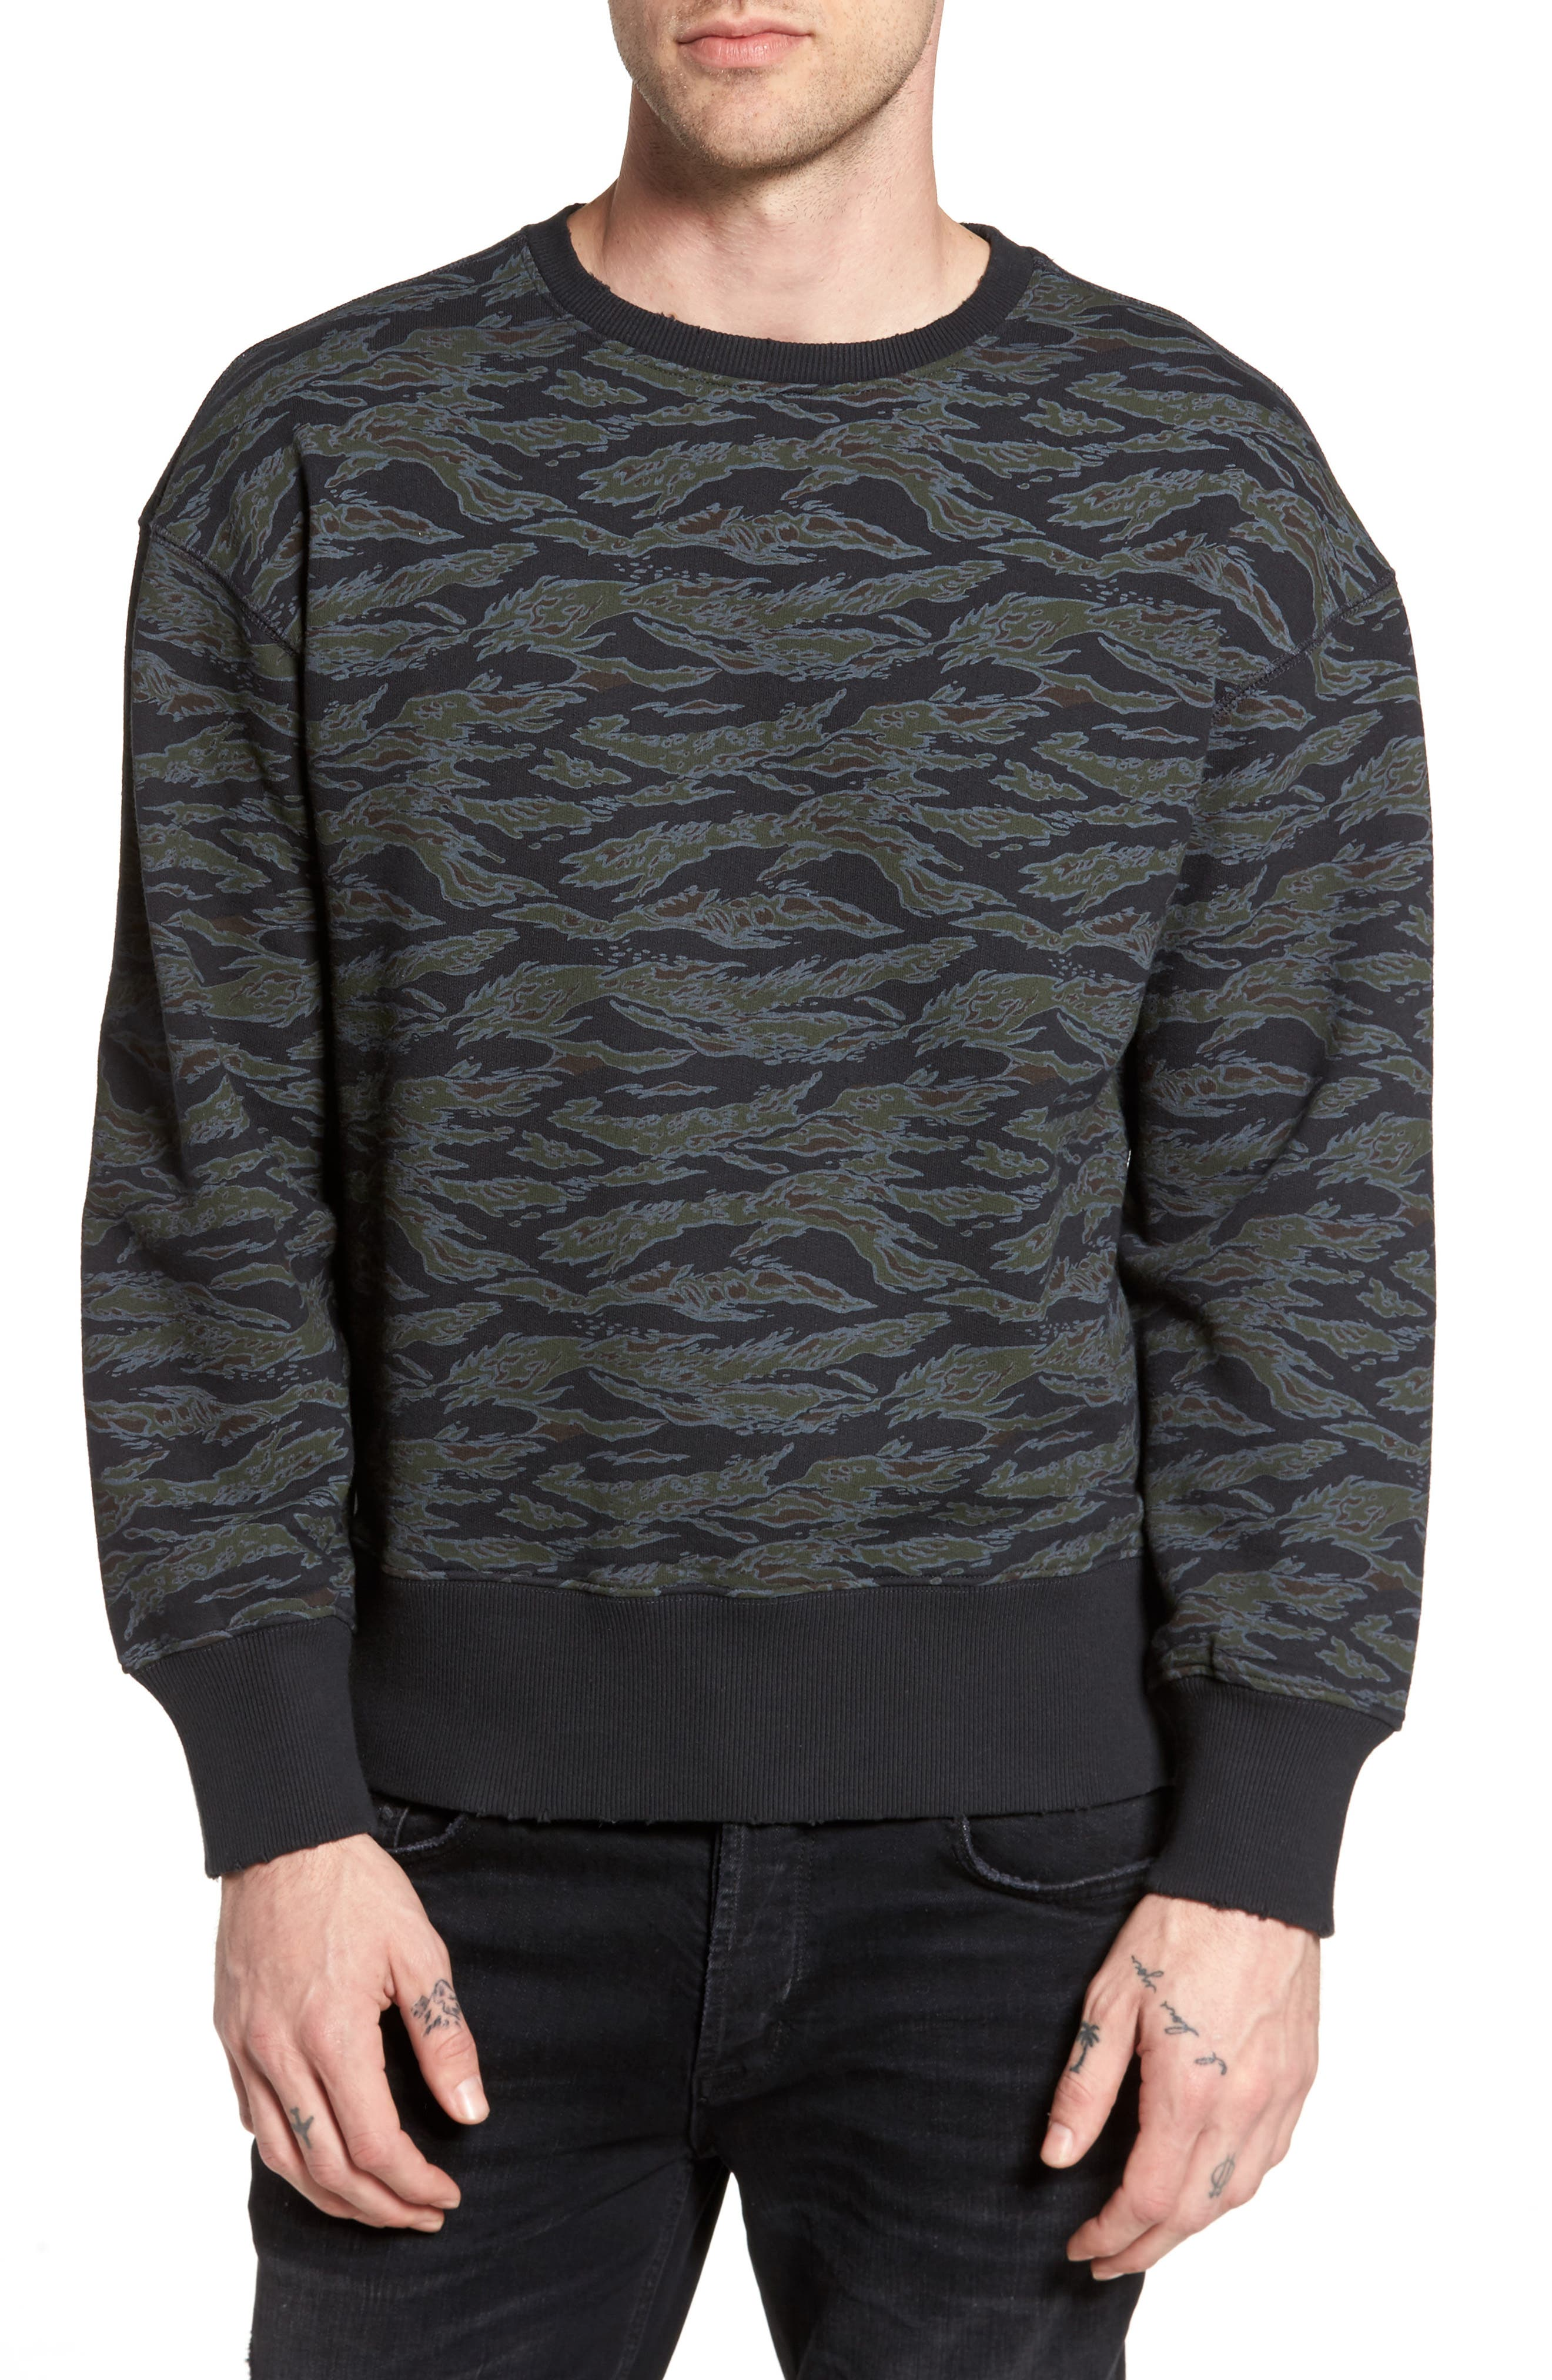 Alternate Image 1 Selected - The Rail Print Sweatshirt